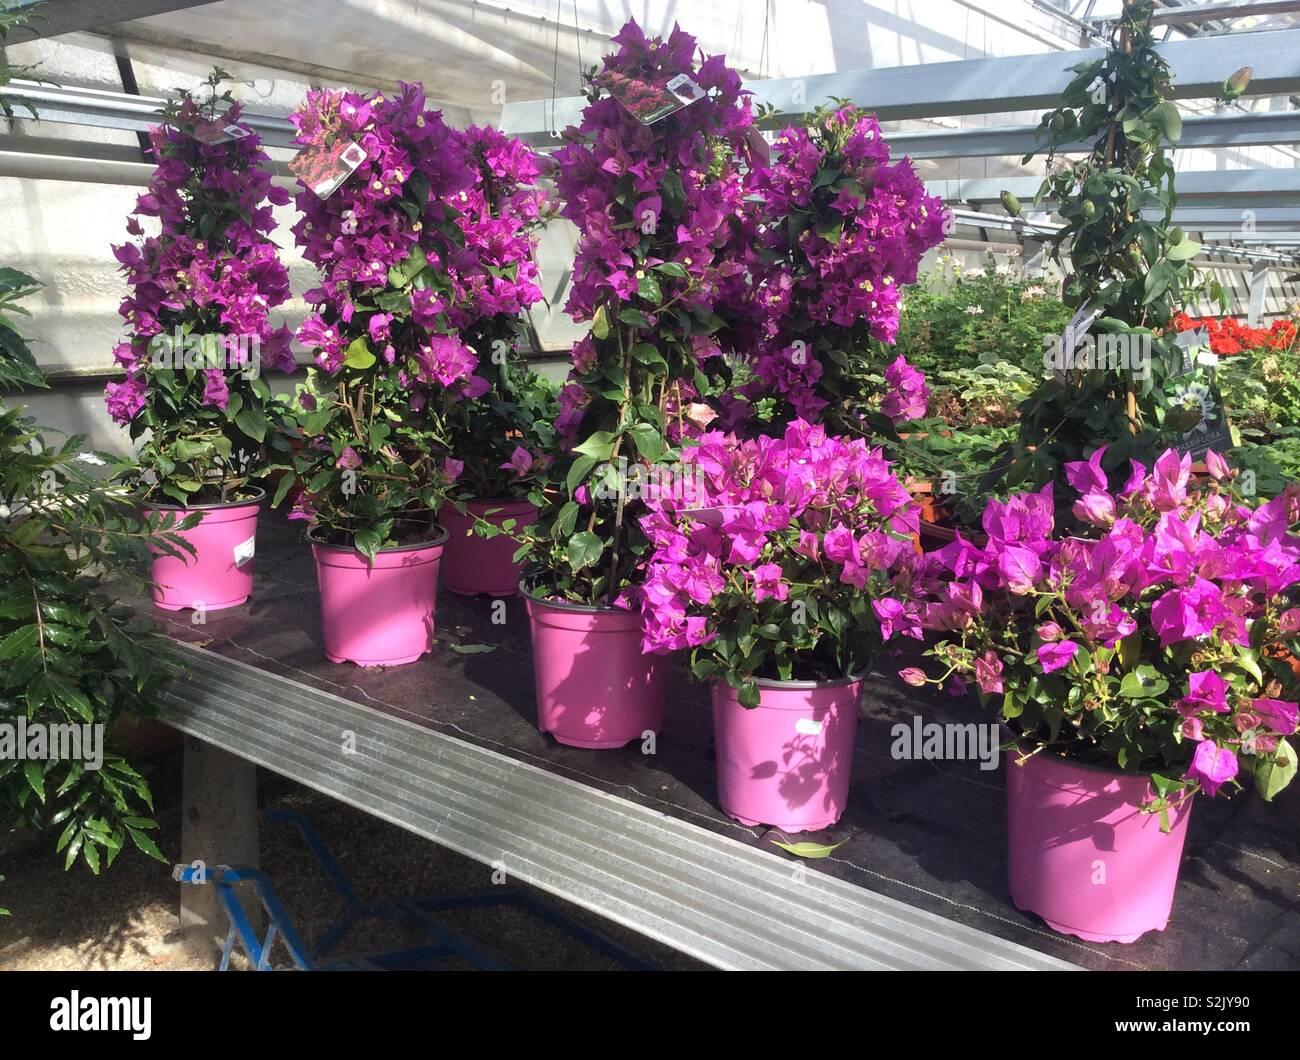 Blooming Lila bougainvillea flowers in pots - Stock Image